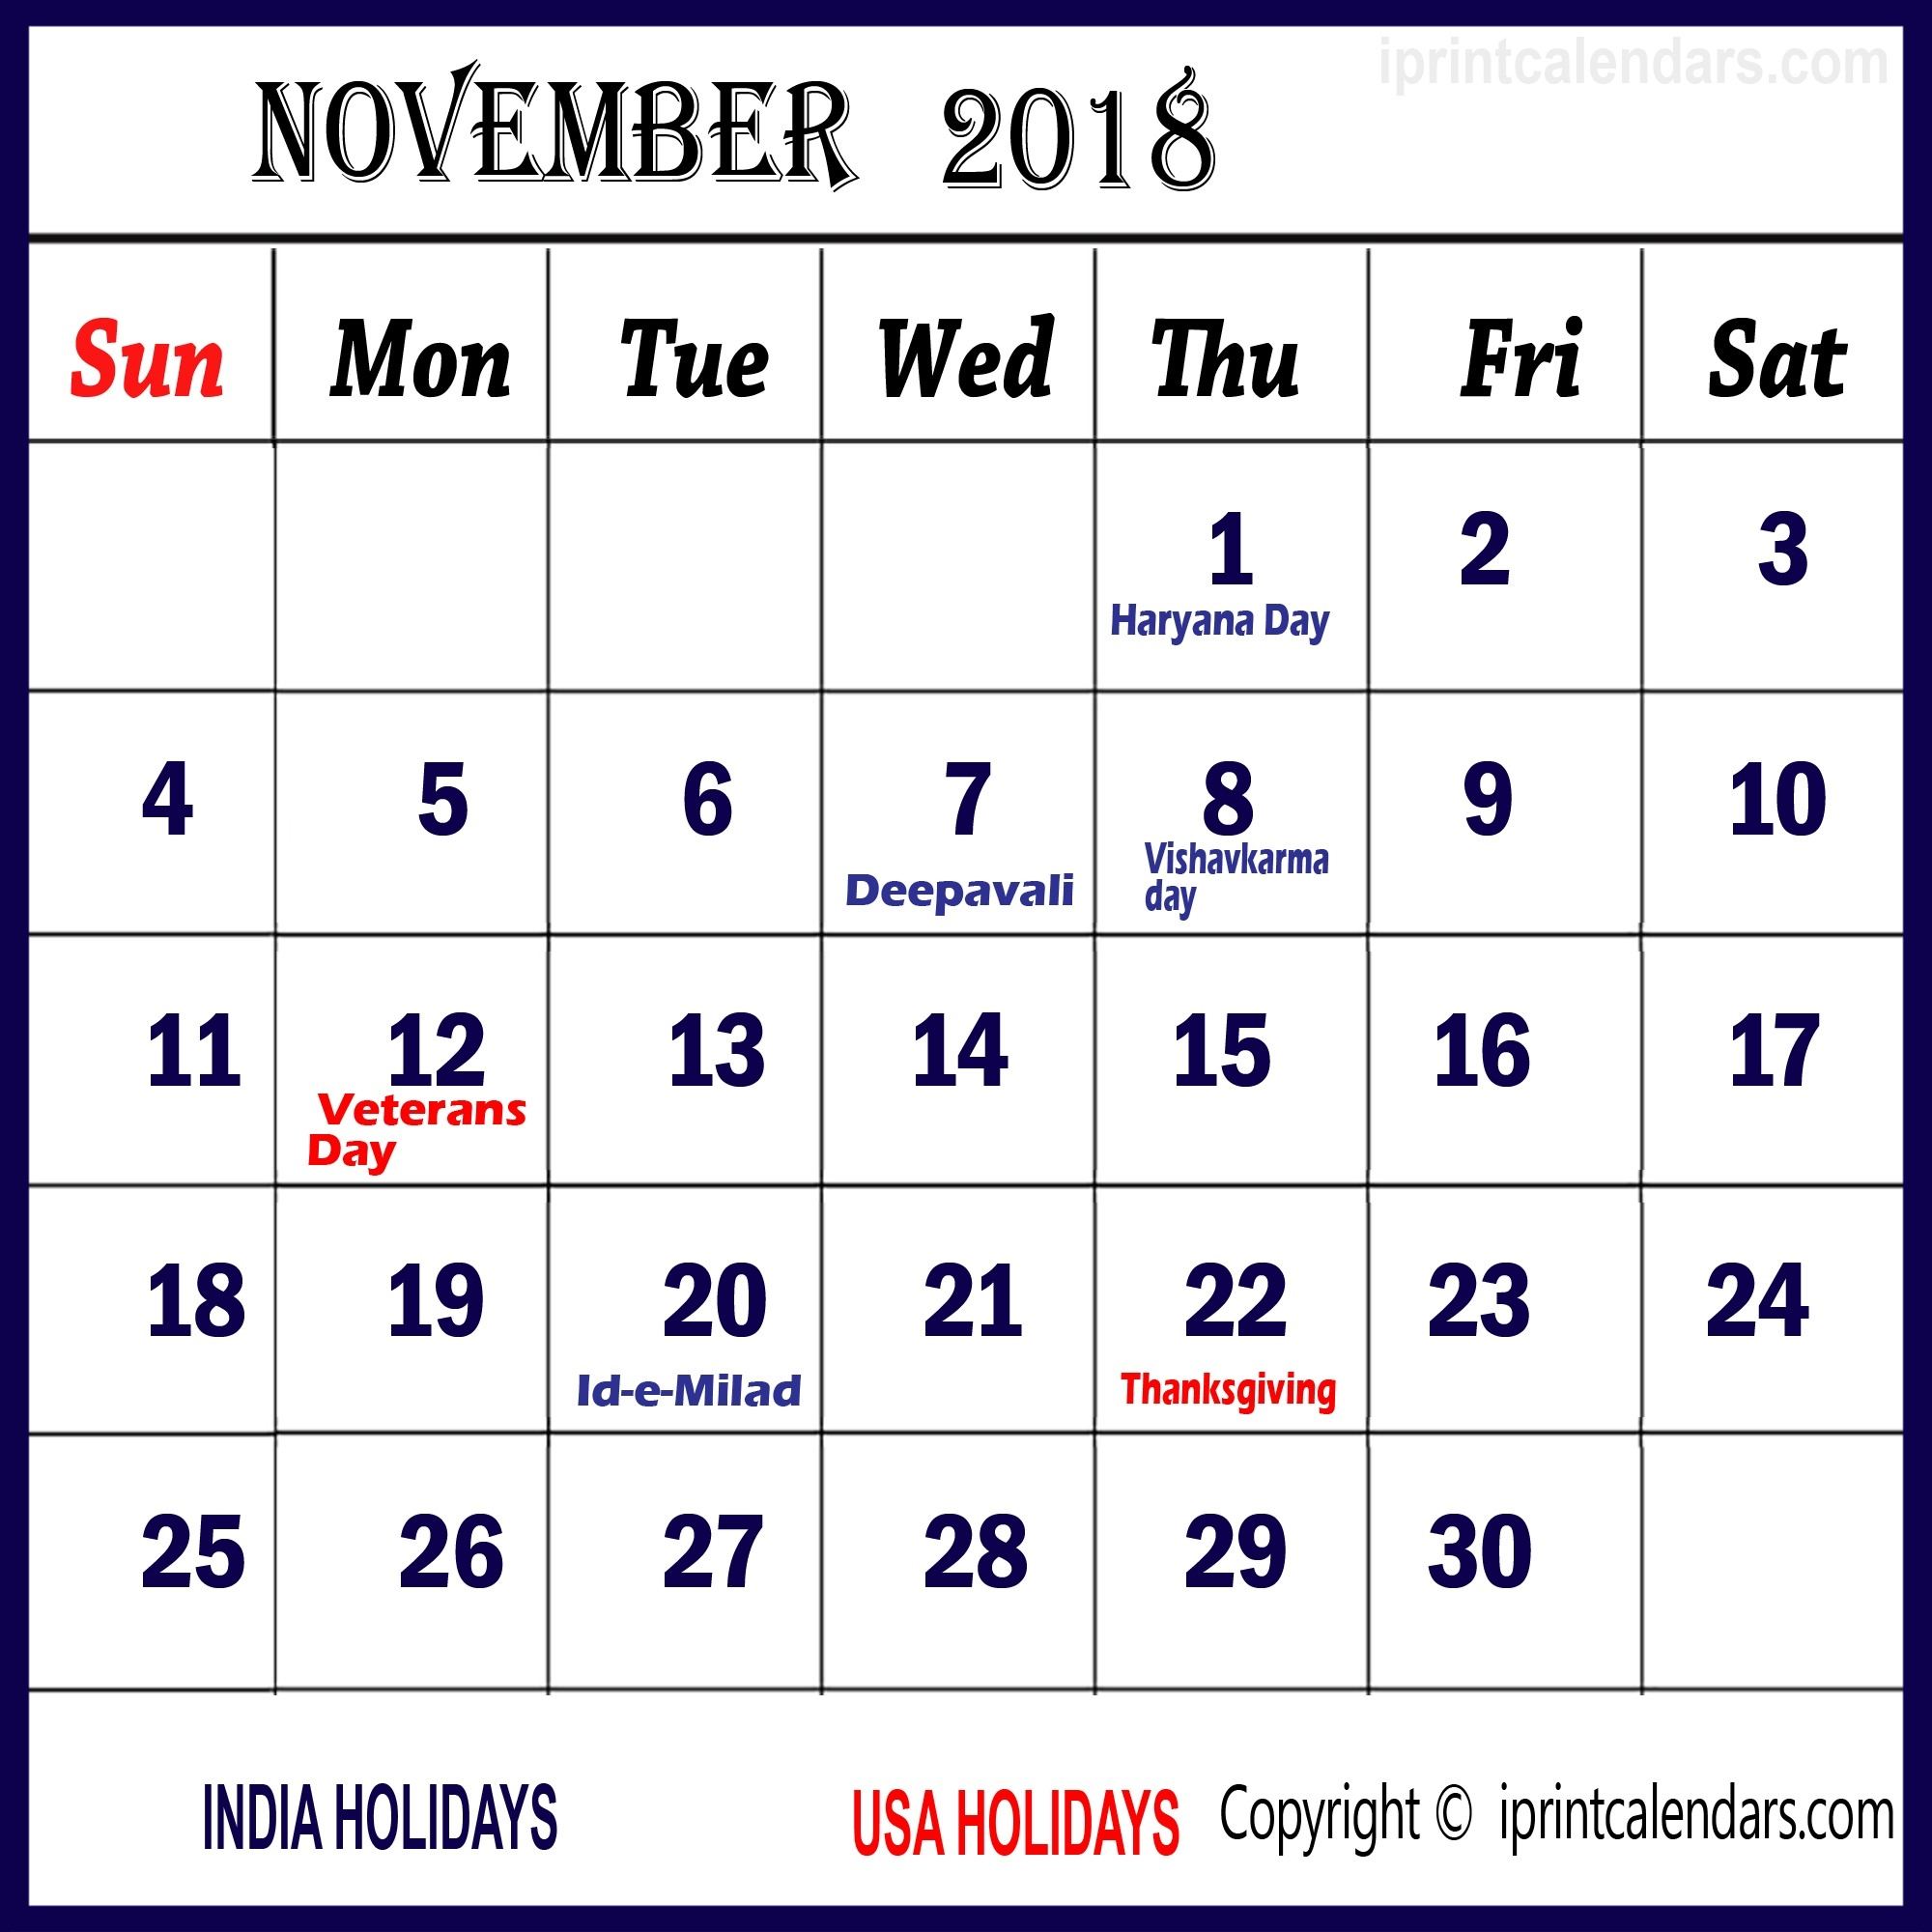 November 2018 Calendars India